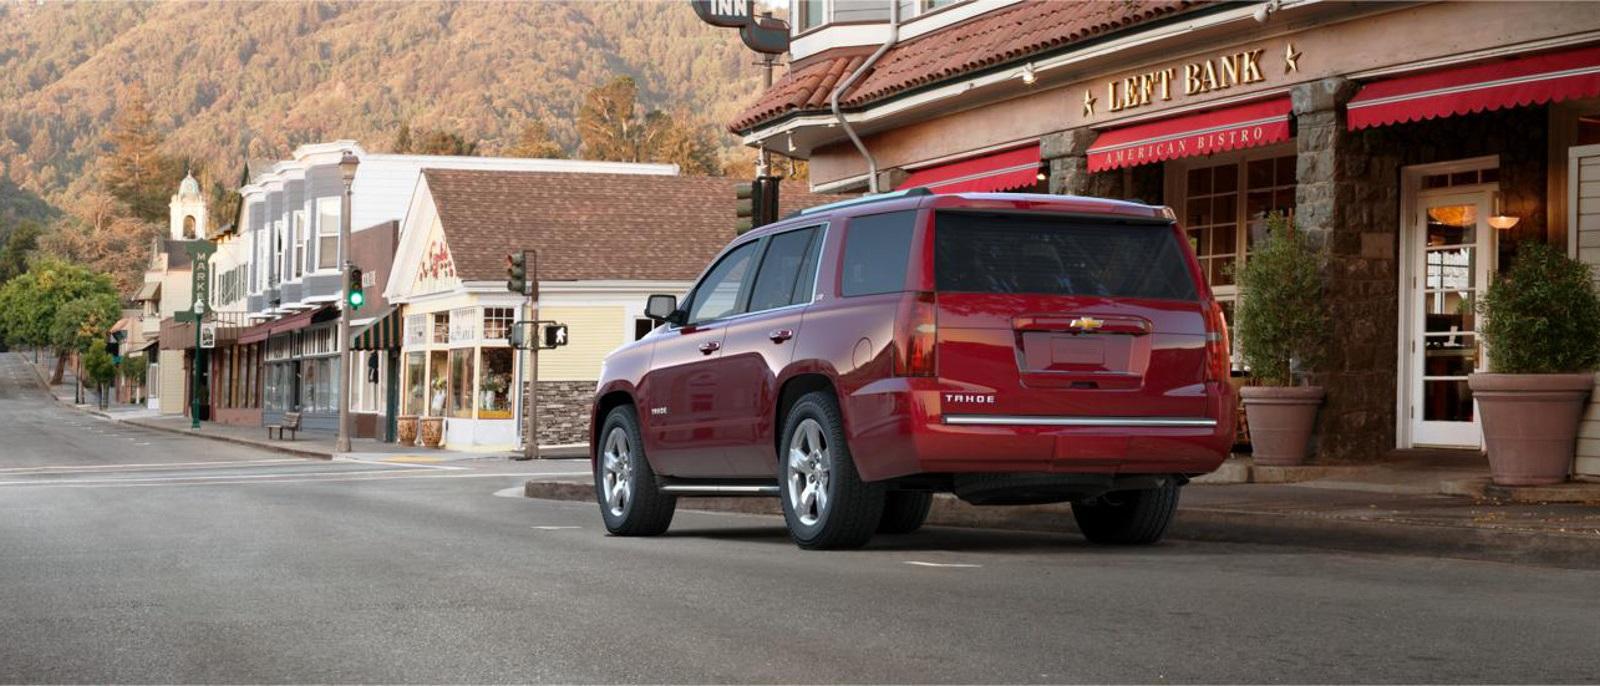 2015 Chevrolet Tahoe Rear Exterior